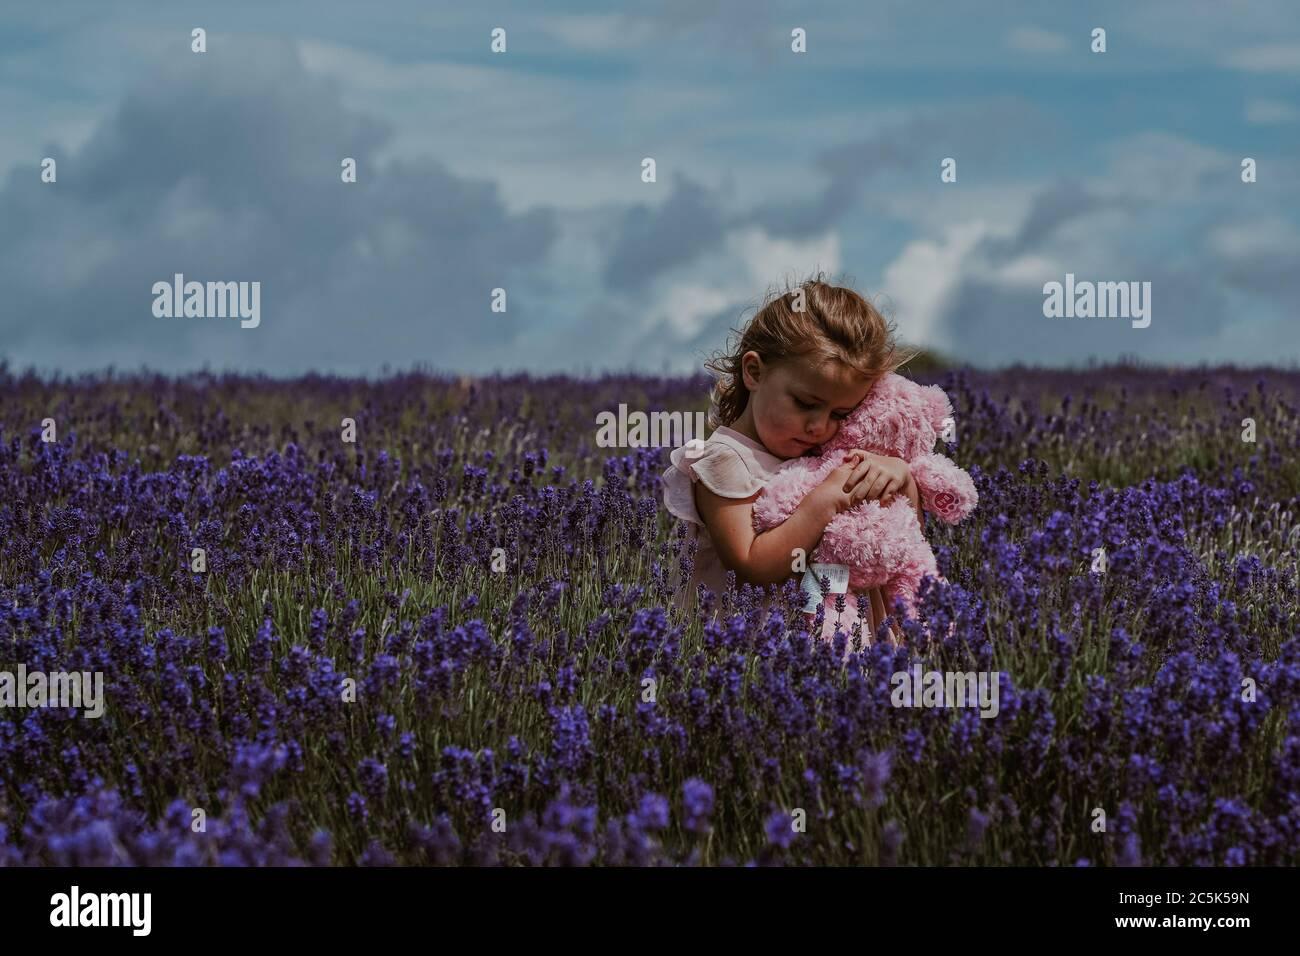 Niña en Lavender Field, Reino Unido Foto de stock